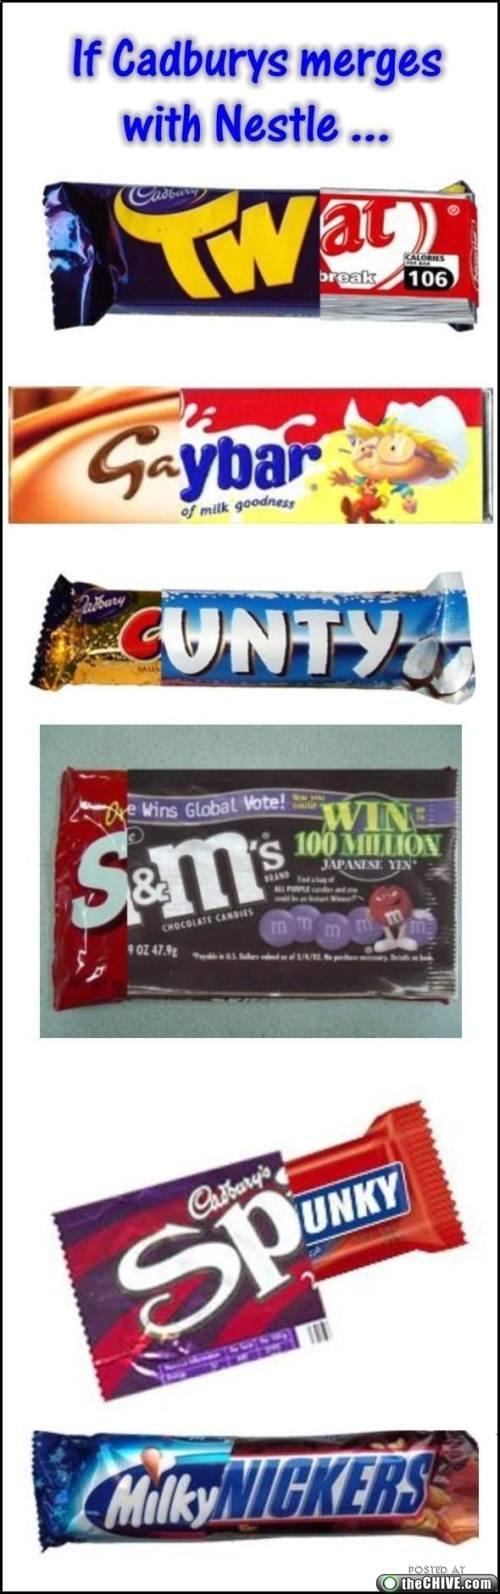 Cadbury Nestle Merger. .. Anyone else chuckle uncontrollably at MilkyNickers?